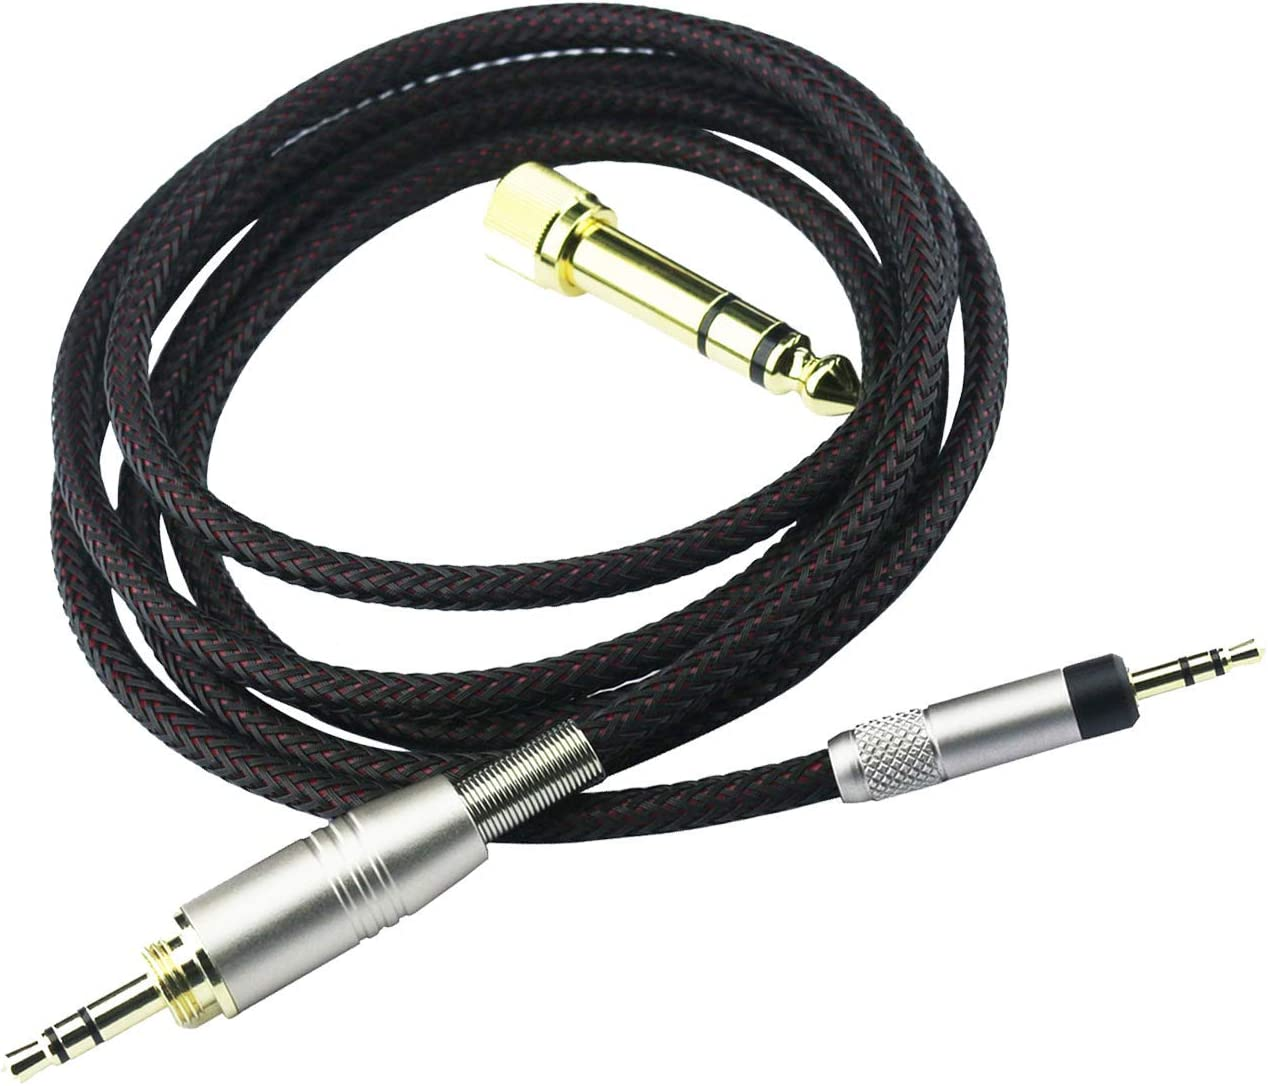 Cable Para Auriculares De 2 Metros Con Bose Qc25 Qc35